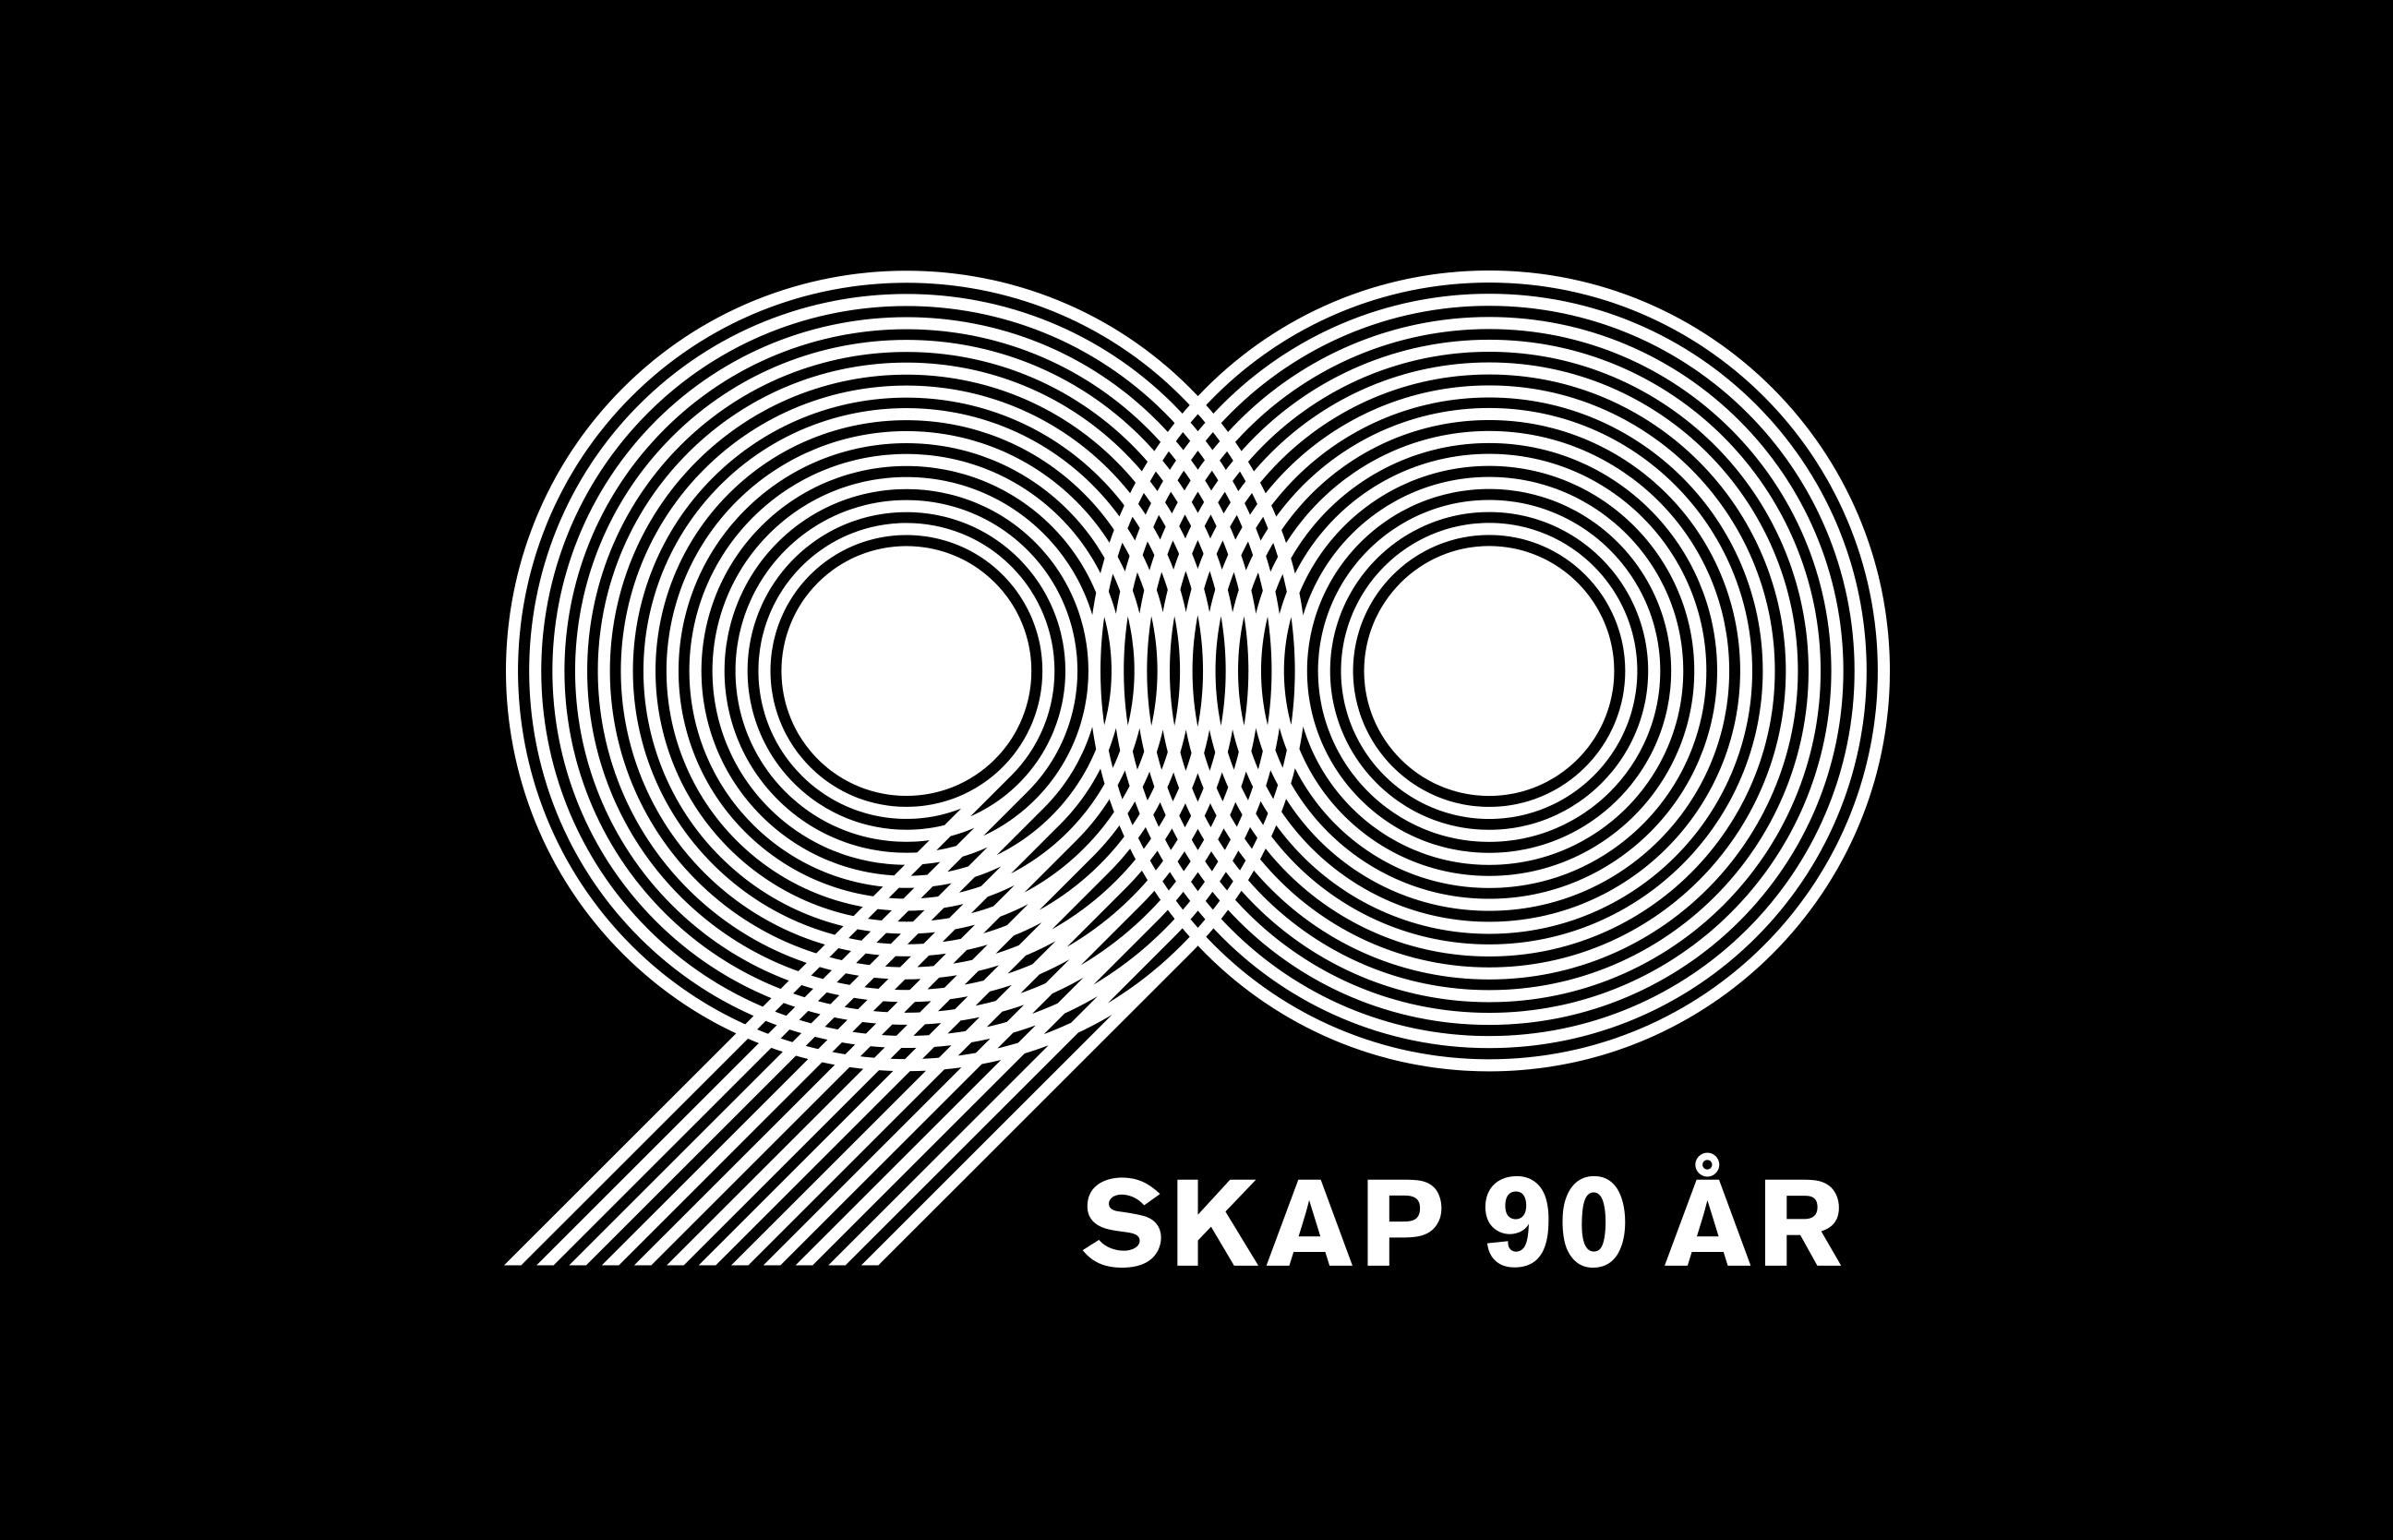 SKAP – 90th anniversary